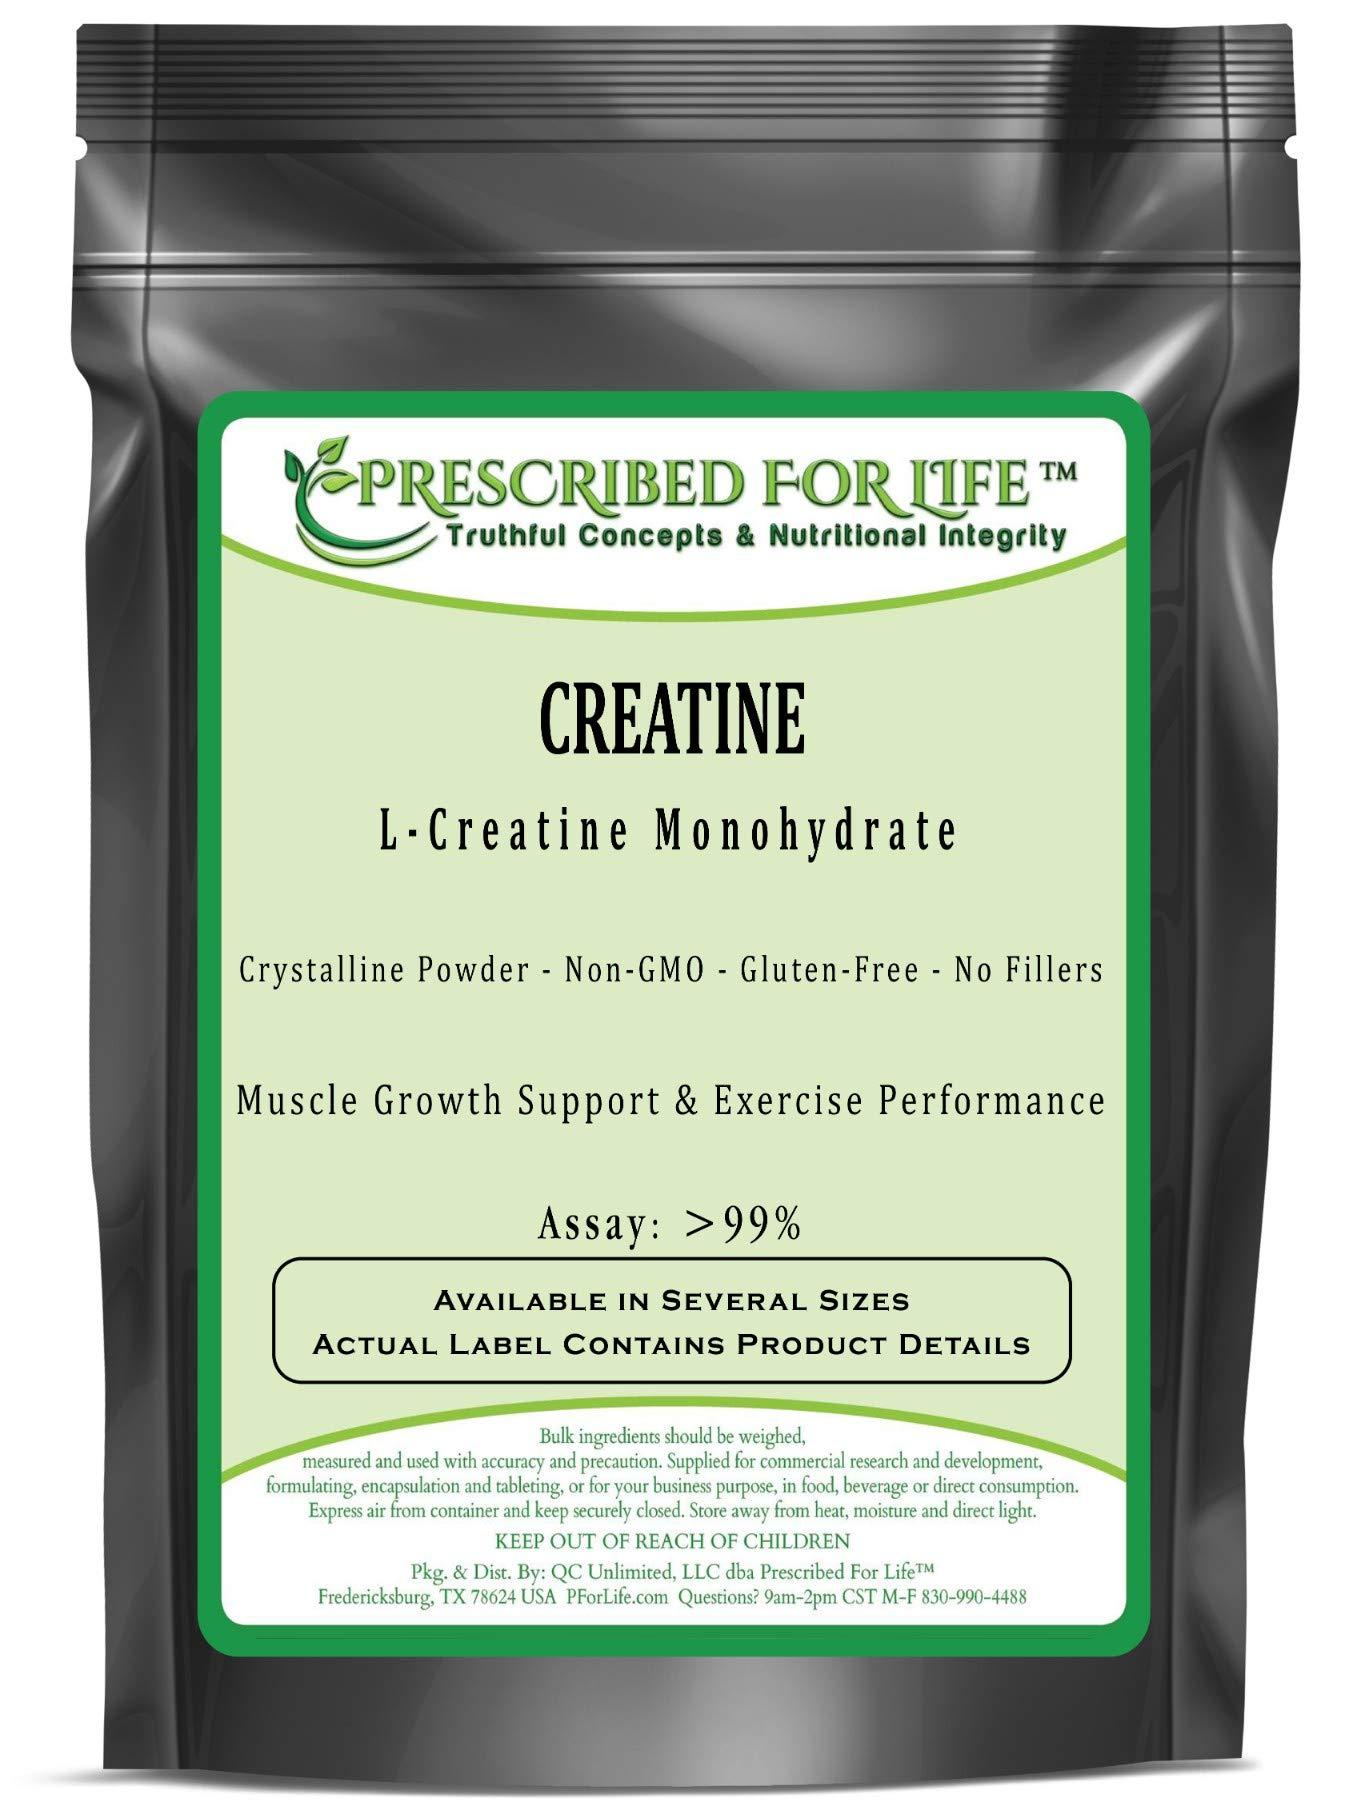 Creatine (L) - Pure L-Creatine Monohydrate Crystalline Powder - 80 Mesh, 25 kg